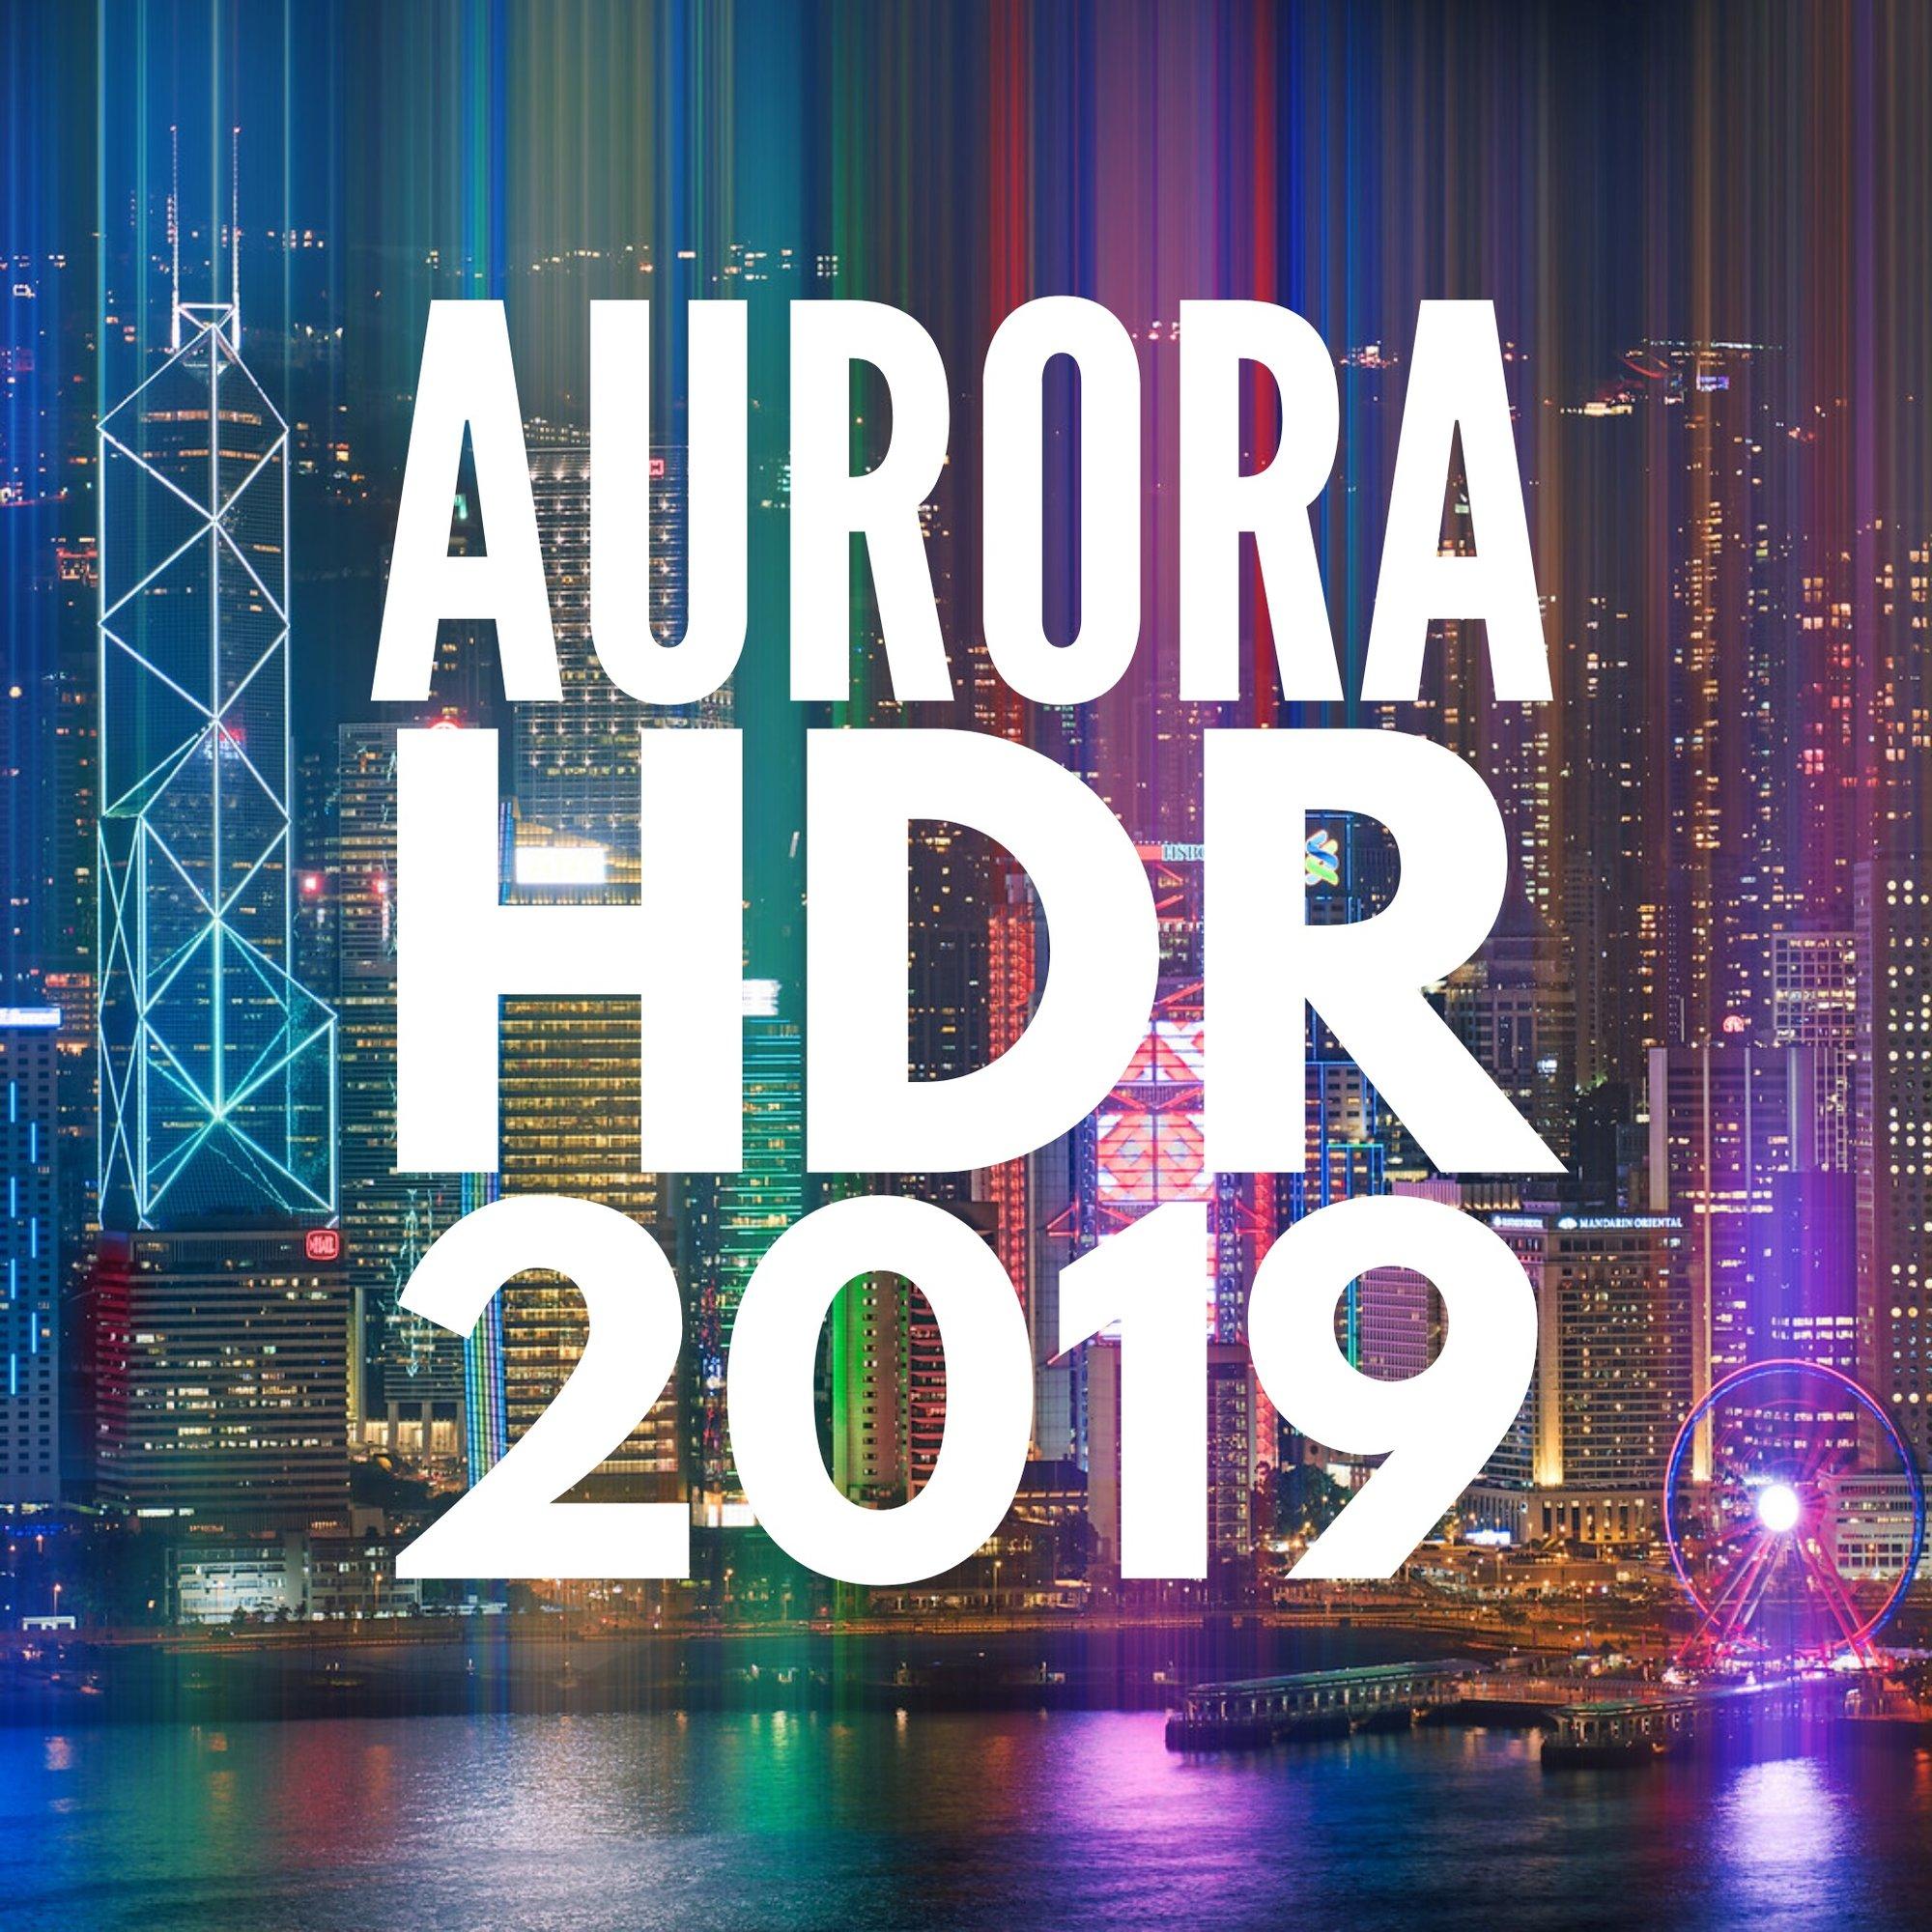 AURORA HDR 2019 FULL MEGA DESCARGAR AURORAR HDR